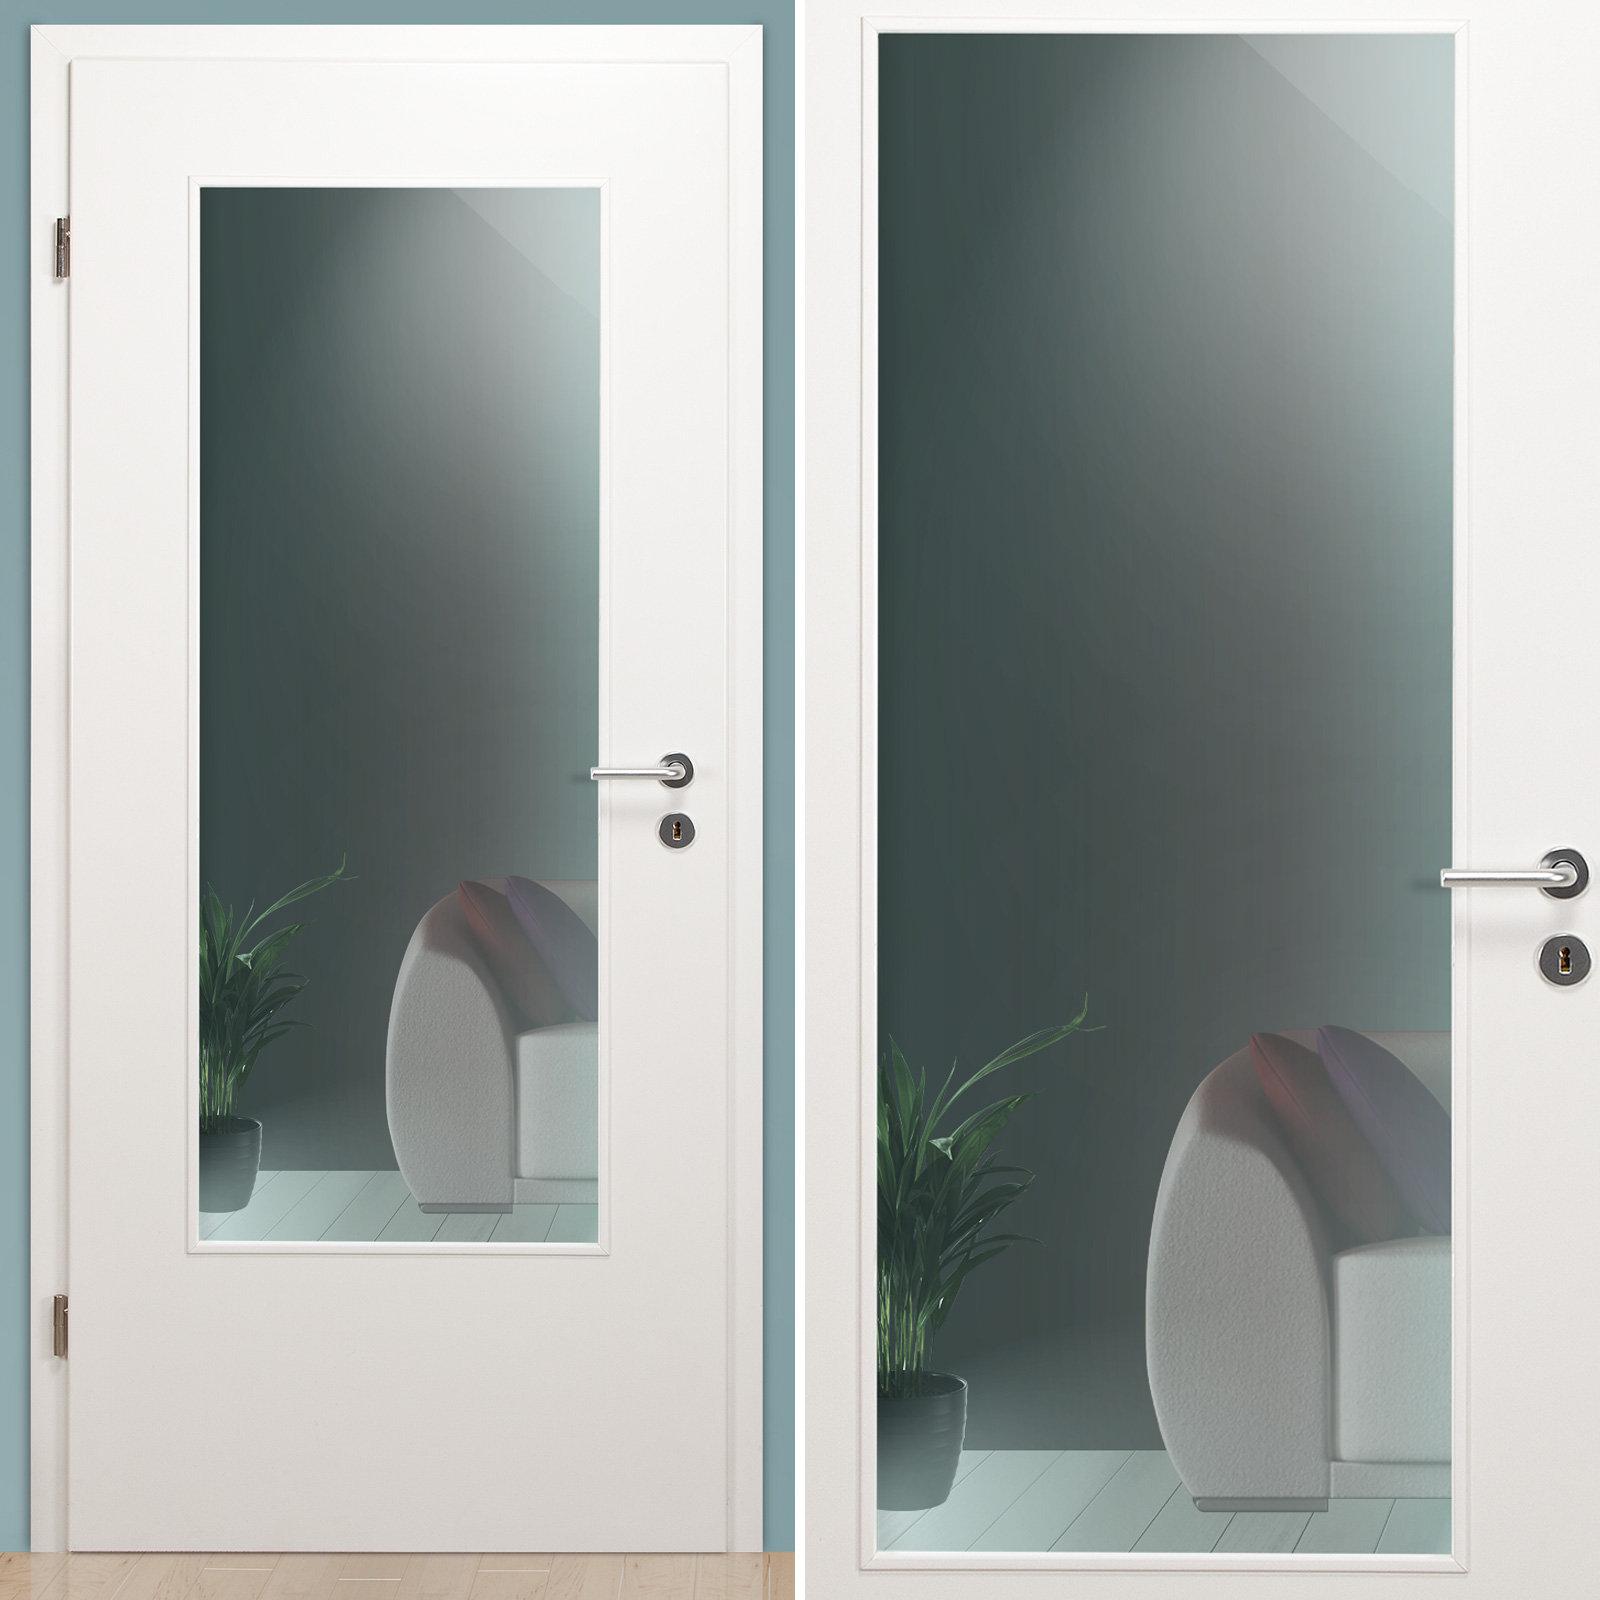 verglasung glaseinsatz f r holzt r 110 1 f la klarglas ohne dekor ebay. Black Bedroom Furniture Sets. Home Design Ideas